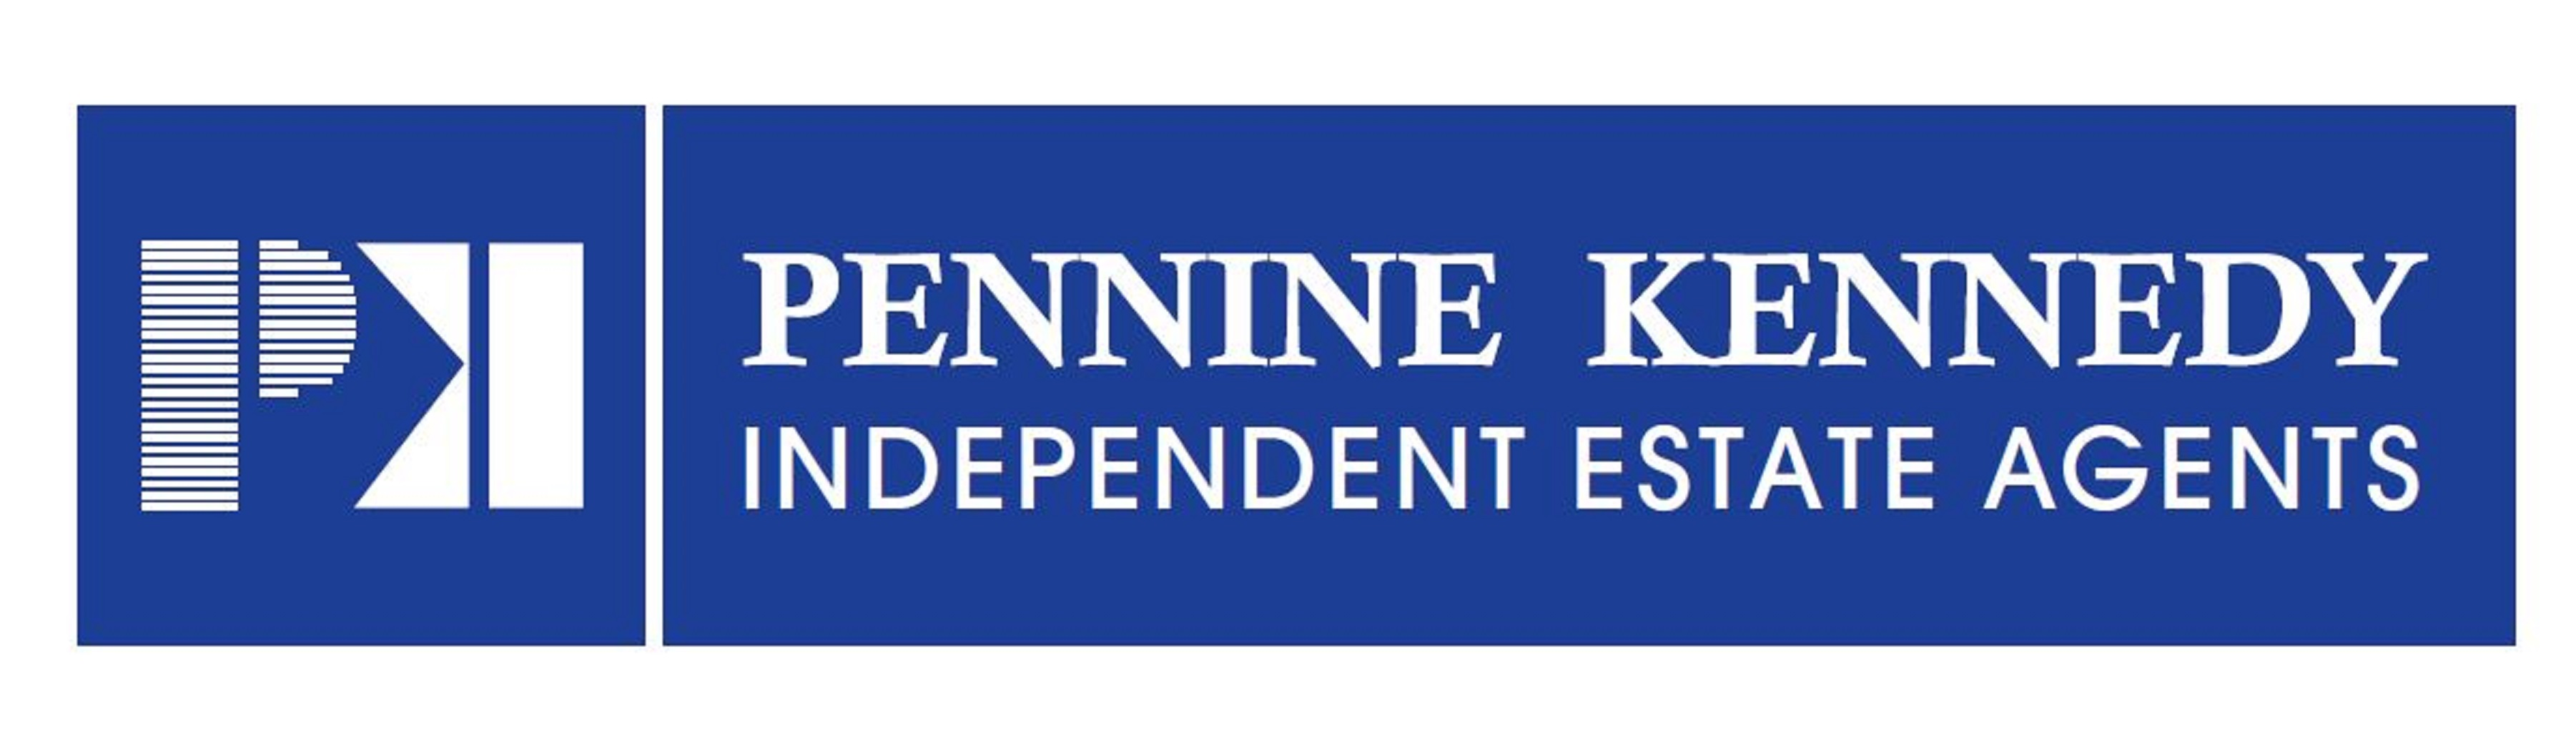 Pennine Kennedy Estate Agents